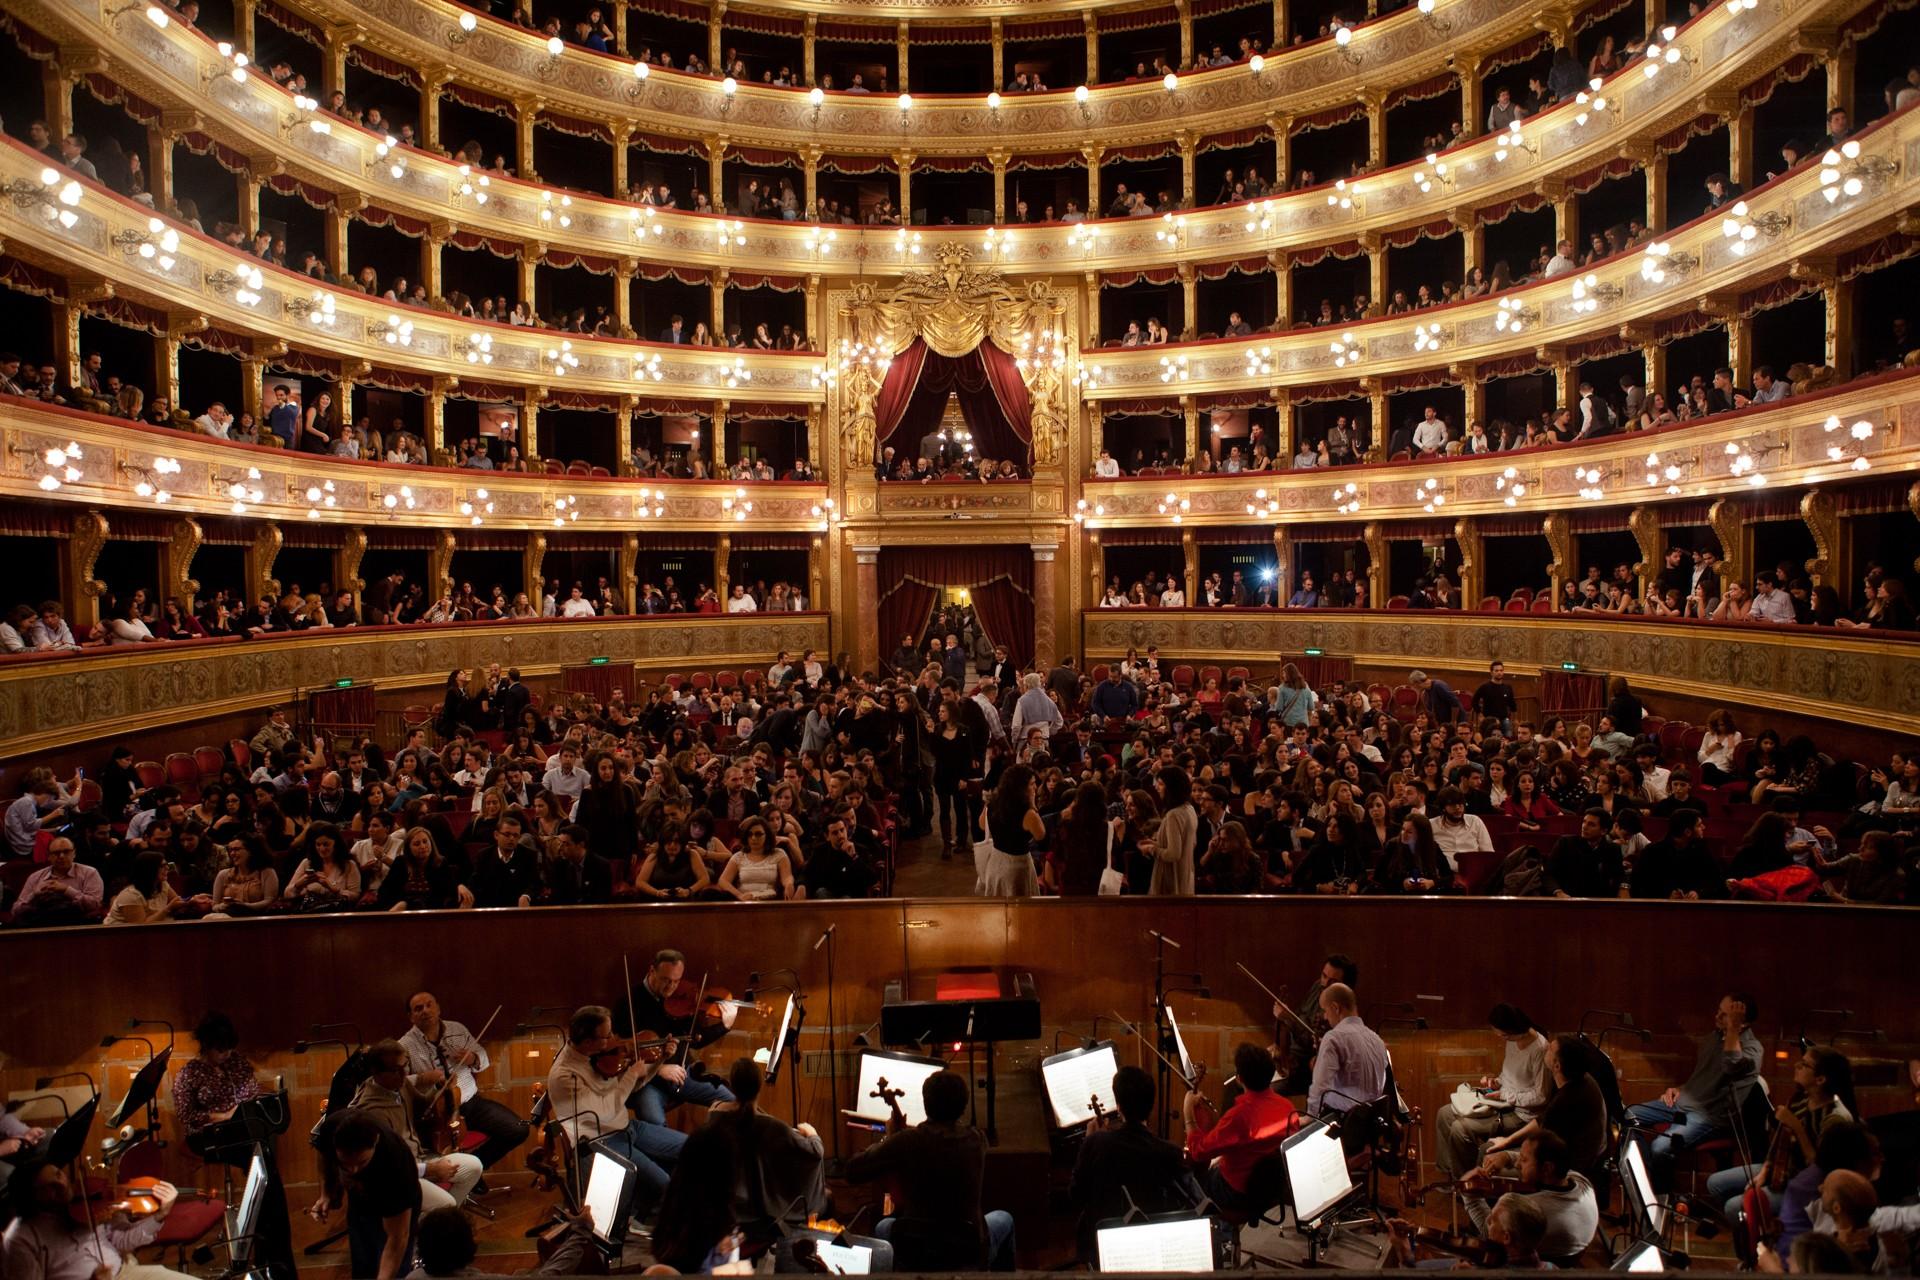 La Orquesta del Teatro Massimo de Palermo, en huelga